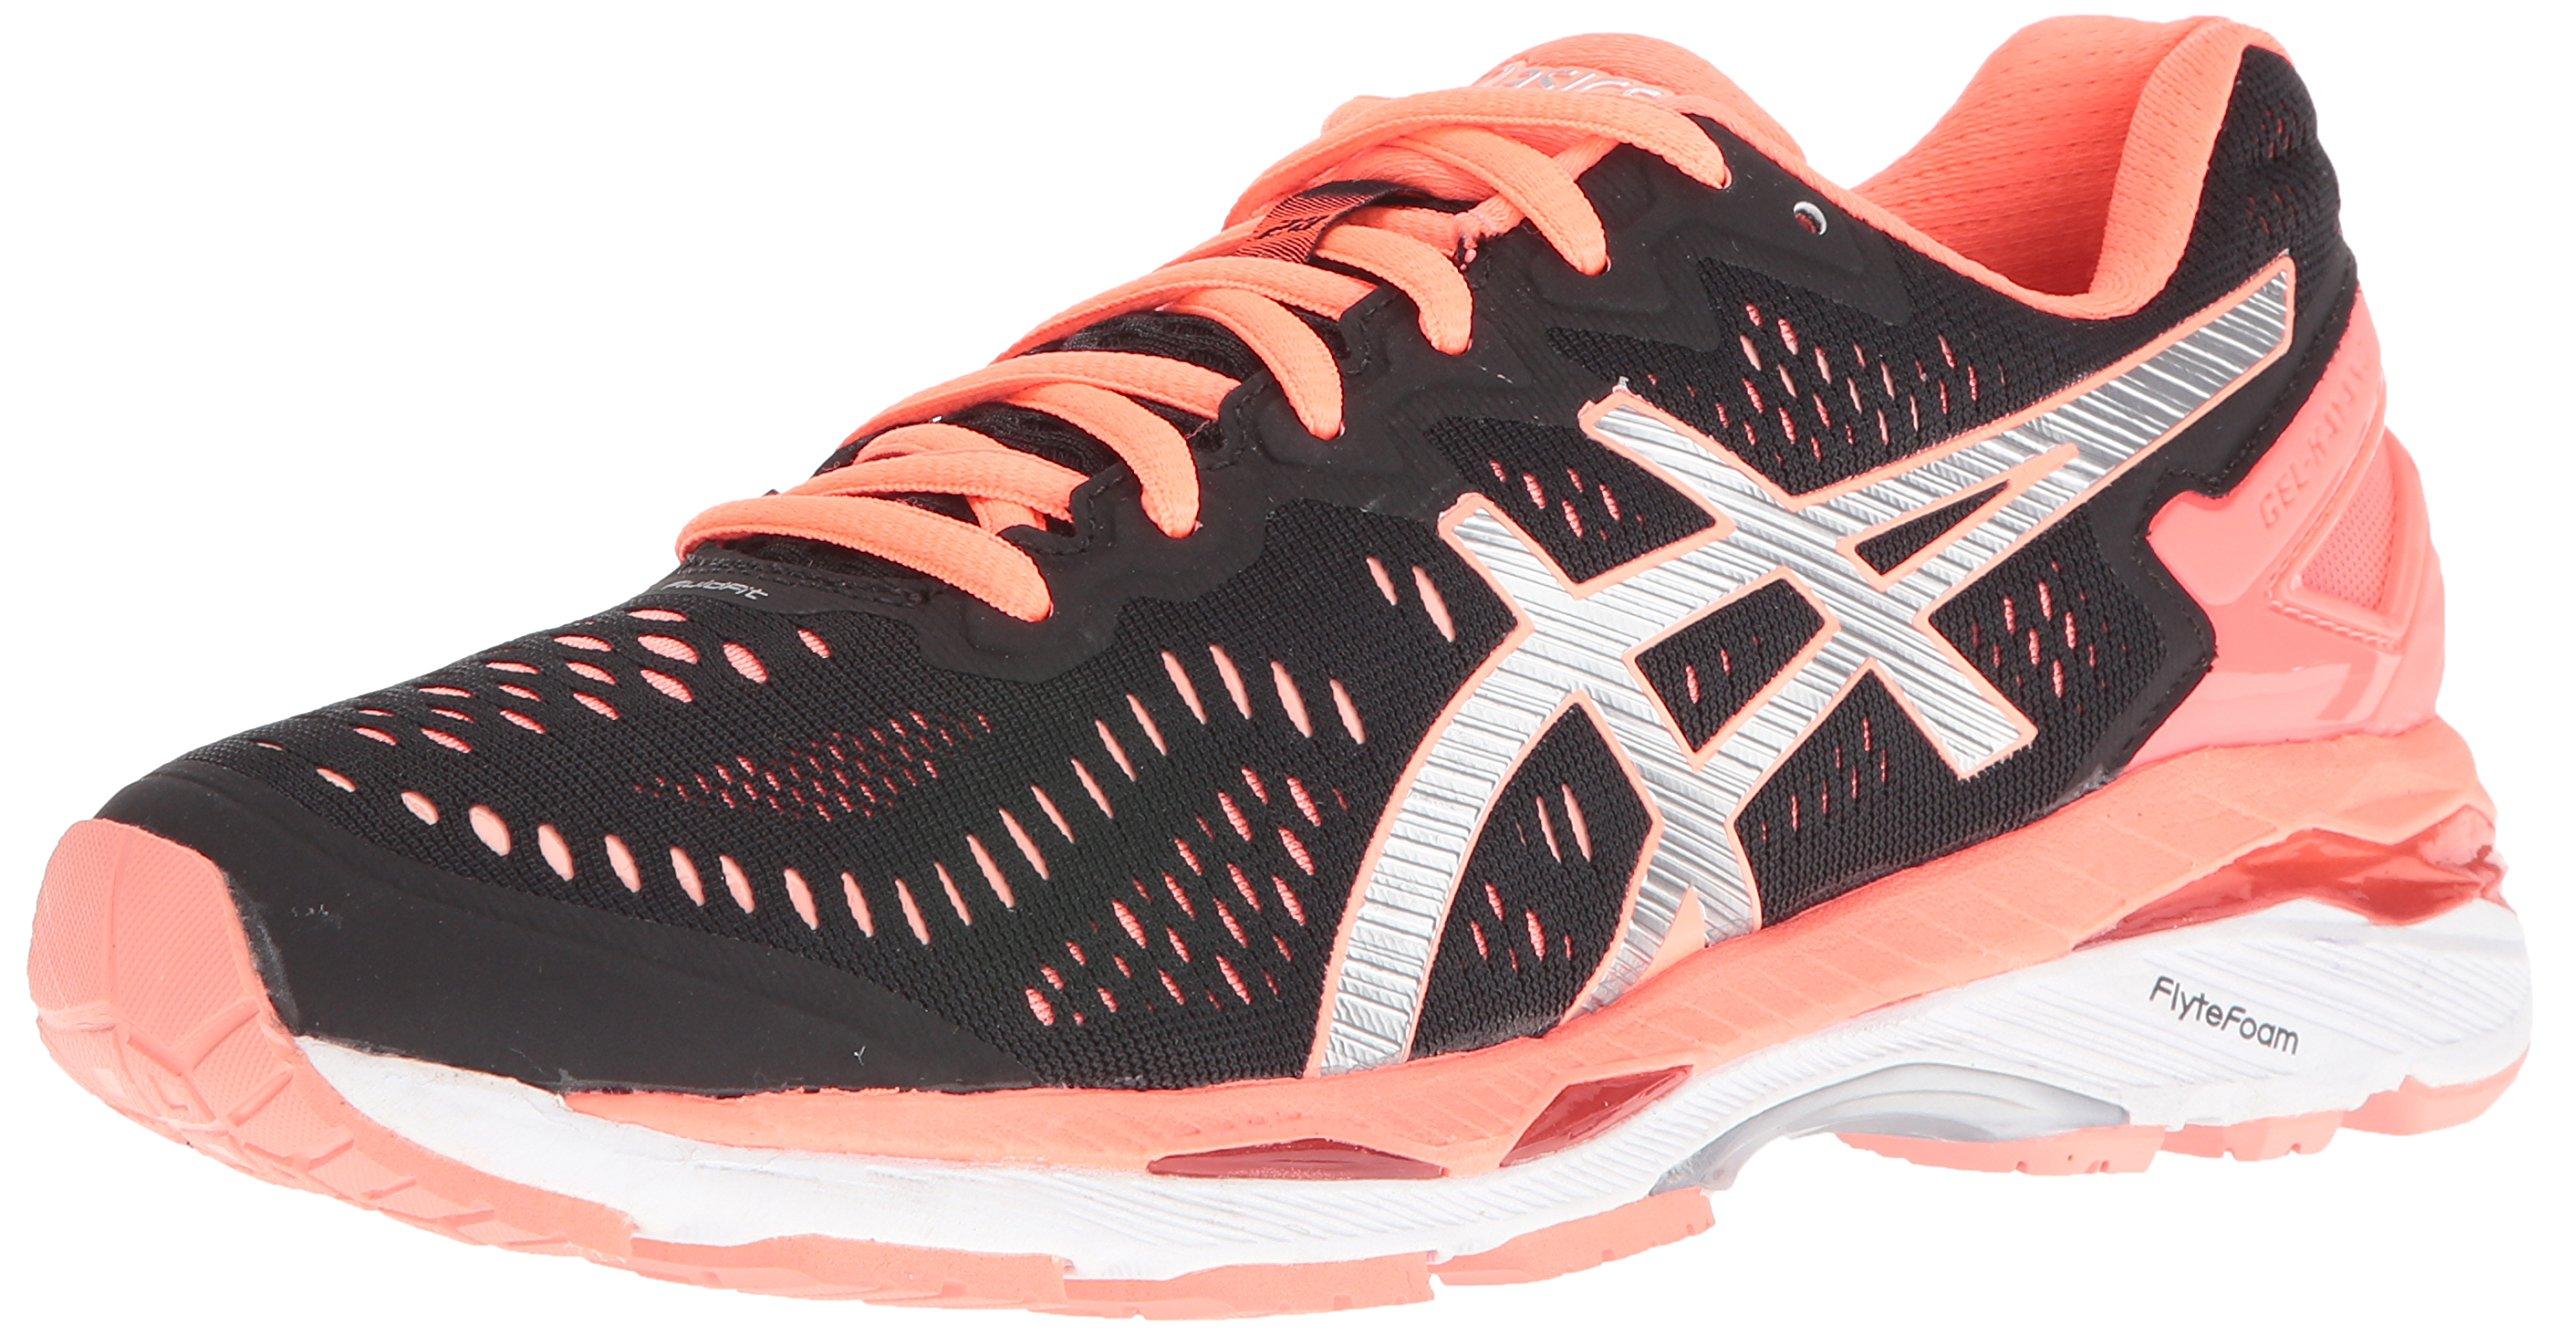 ASICS Women's Gel-Kayano 23 Track Shoe, Black/Silver/Flash Coral, 9 M US